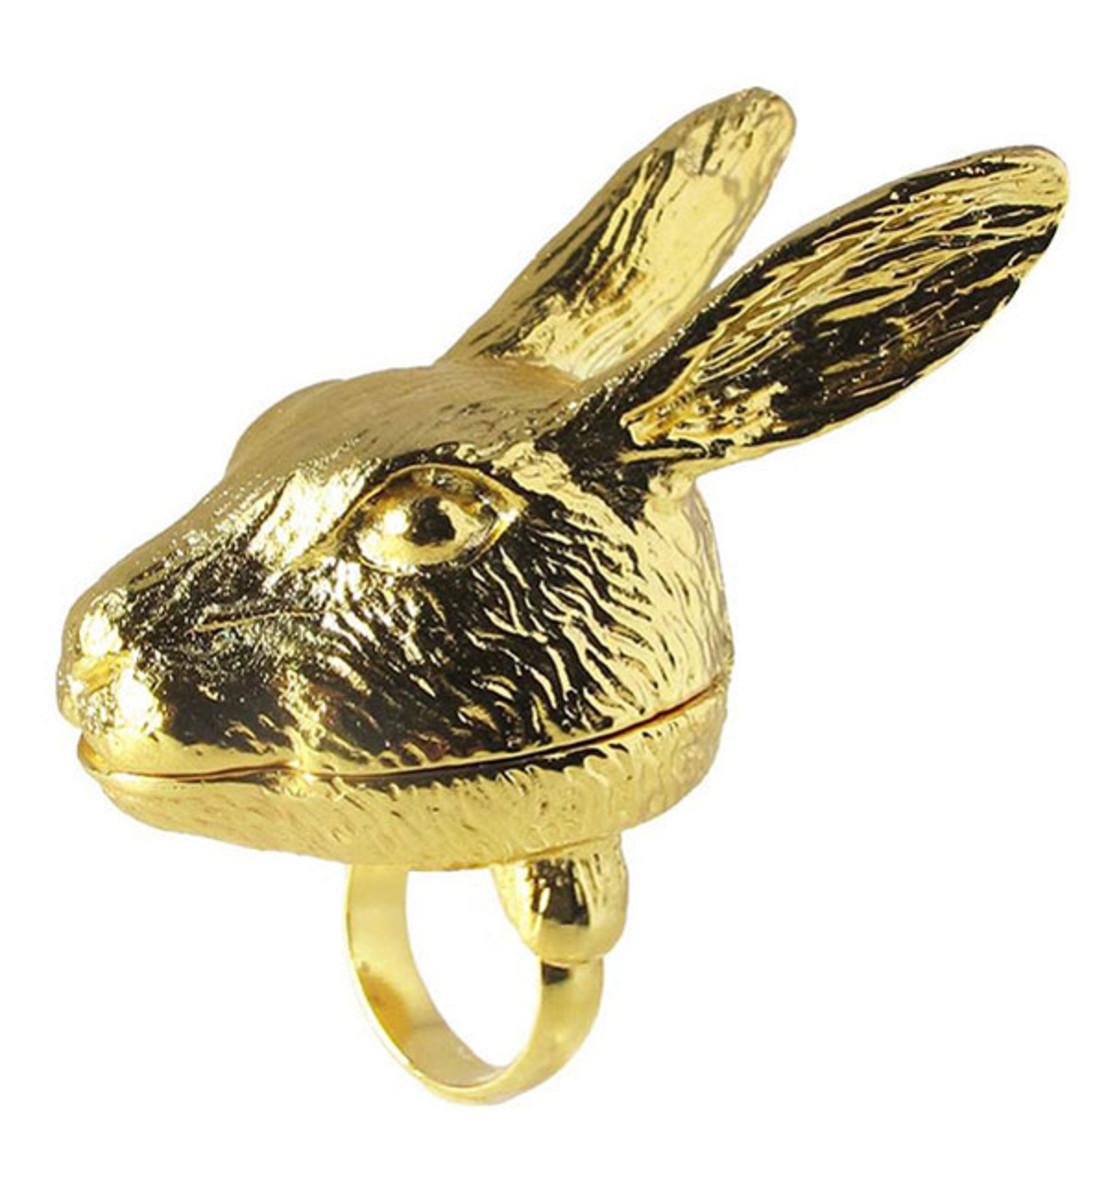 Andrea Garland Bunny Lip Balm Ring